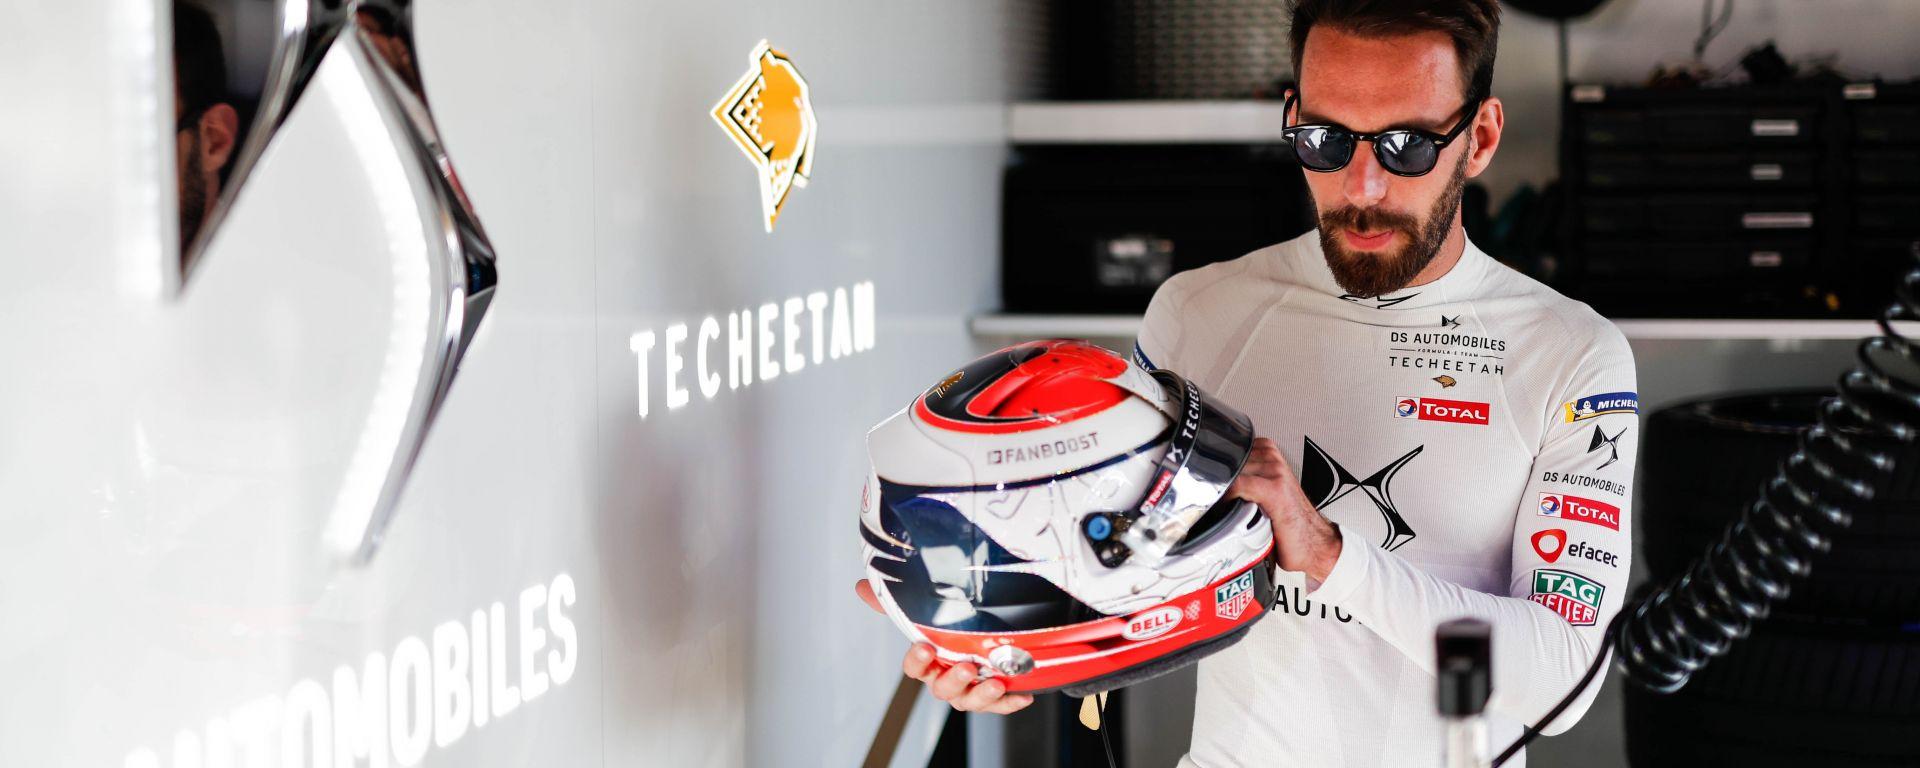 Formula E 2019-2020, Jean-Eric Vergne (DS Techeetah) all'ePrix di Ad Diriyah